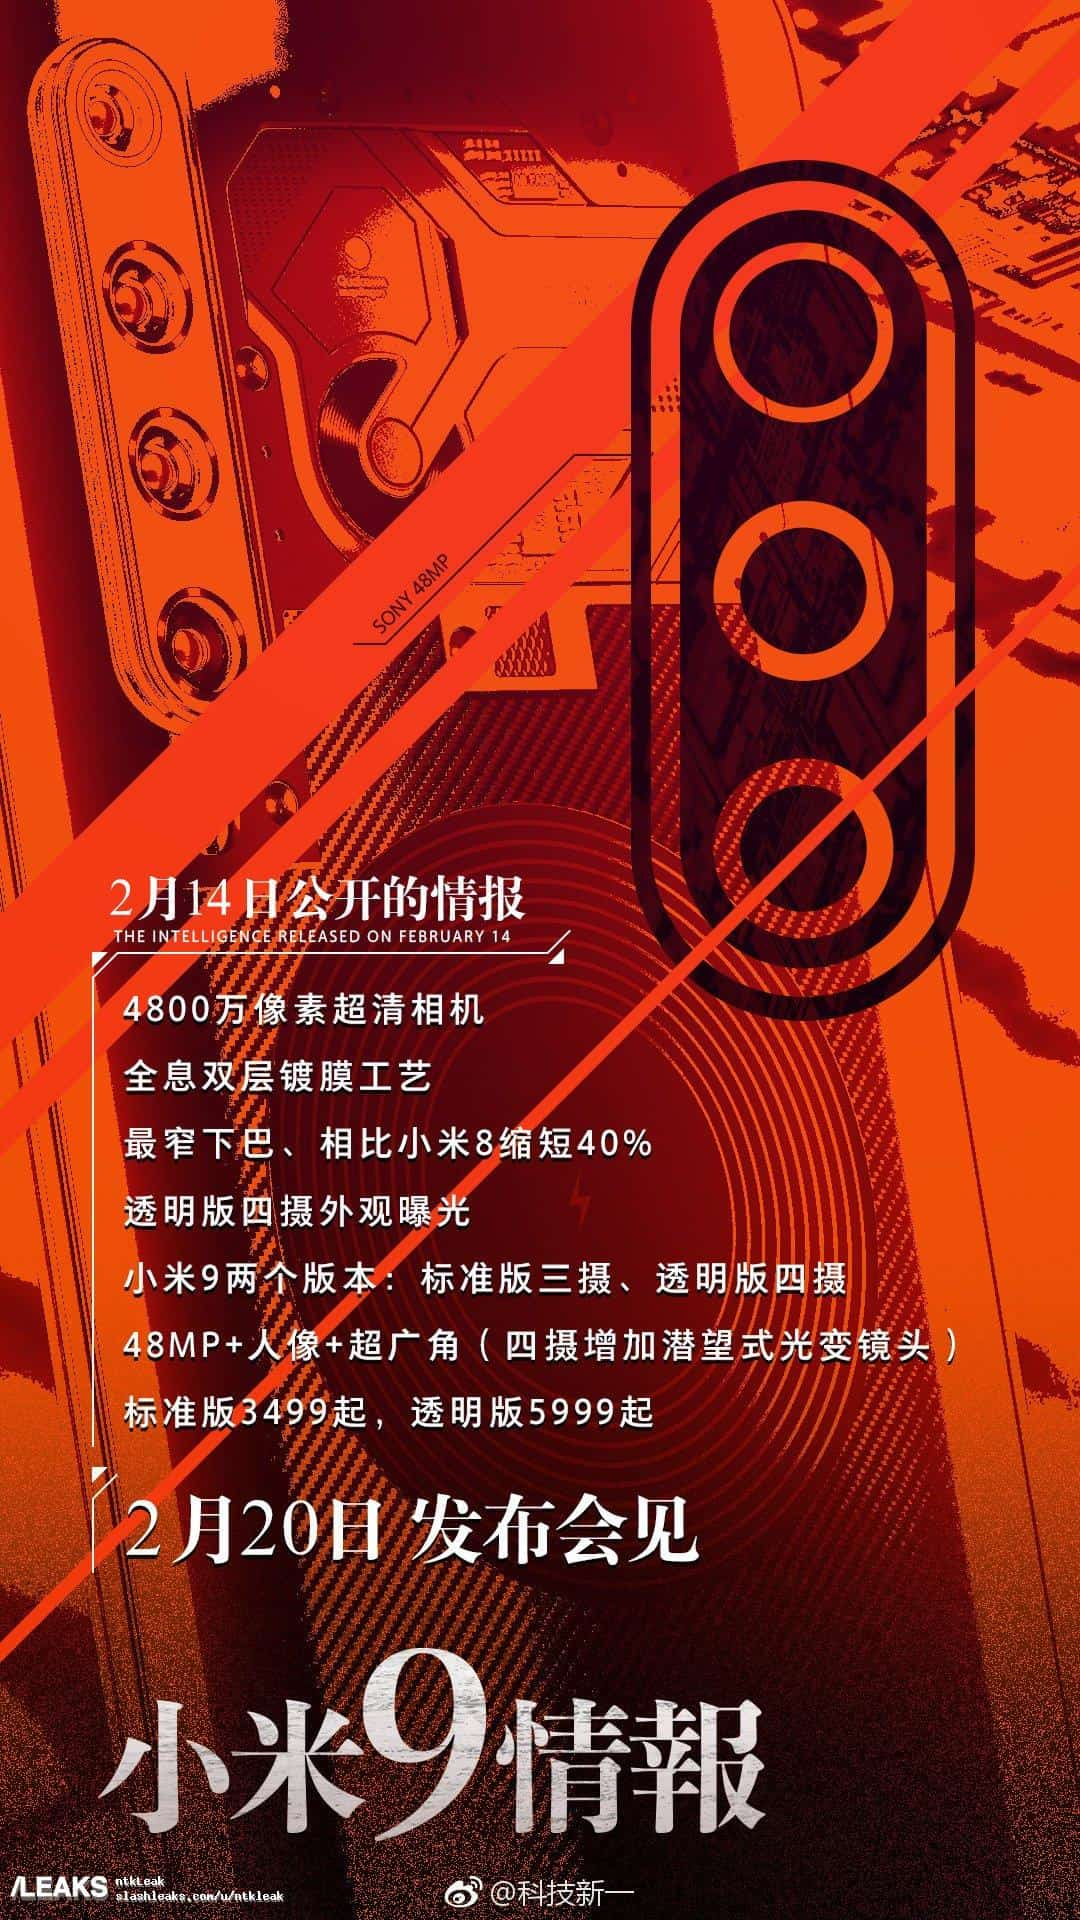 Xiaomi Mi 9 Price and Specs